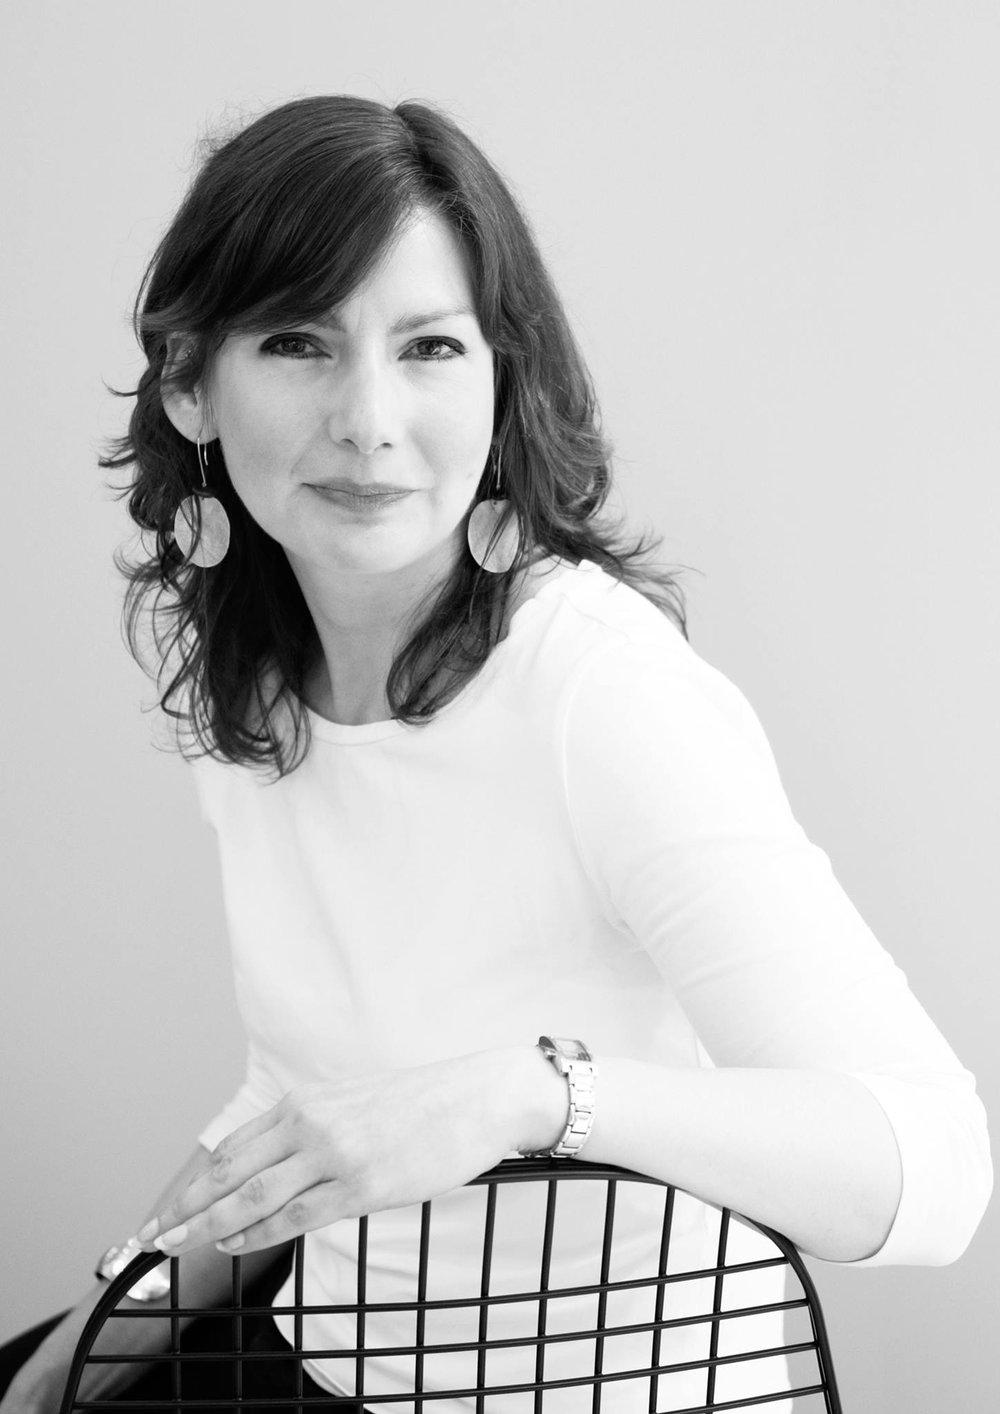 Gemma Profile Pic.jpg